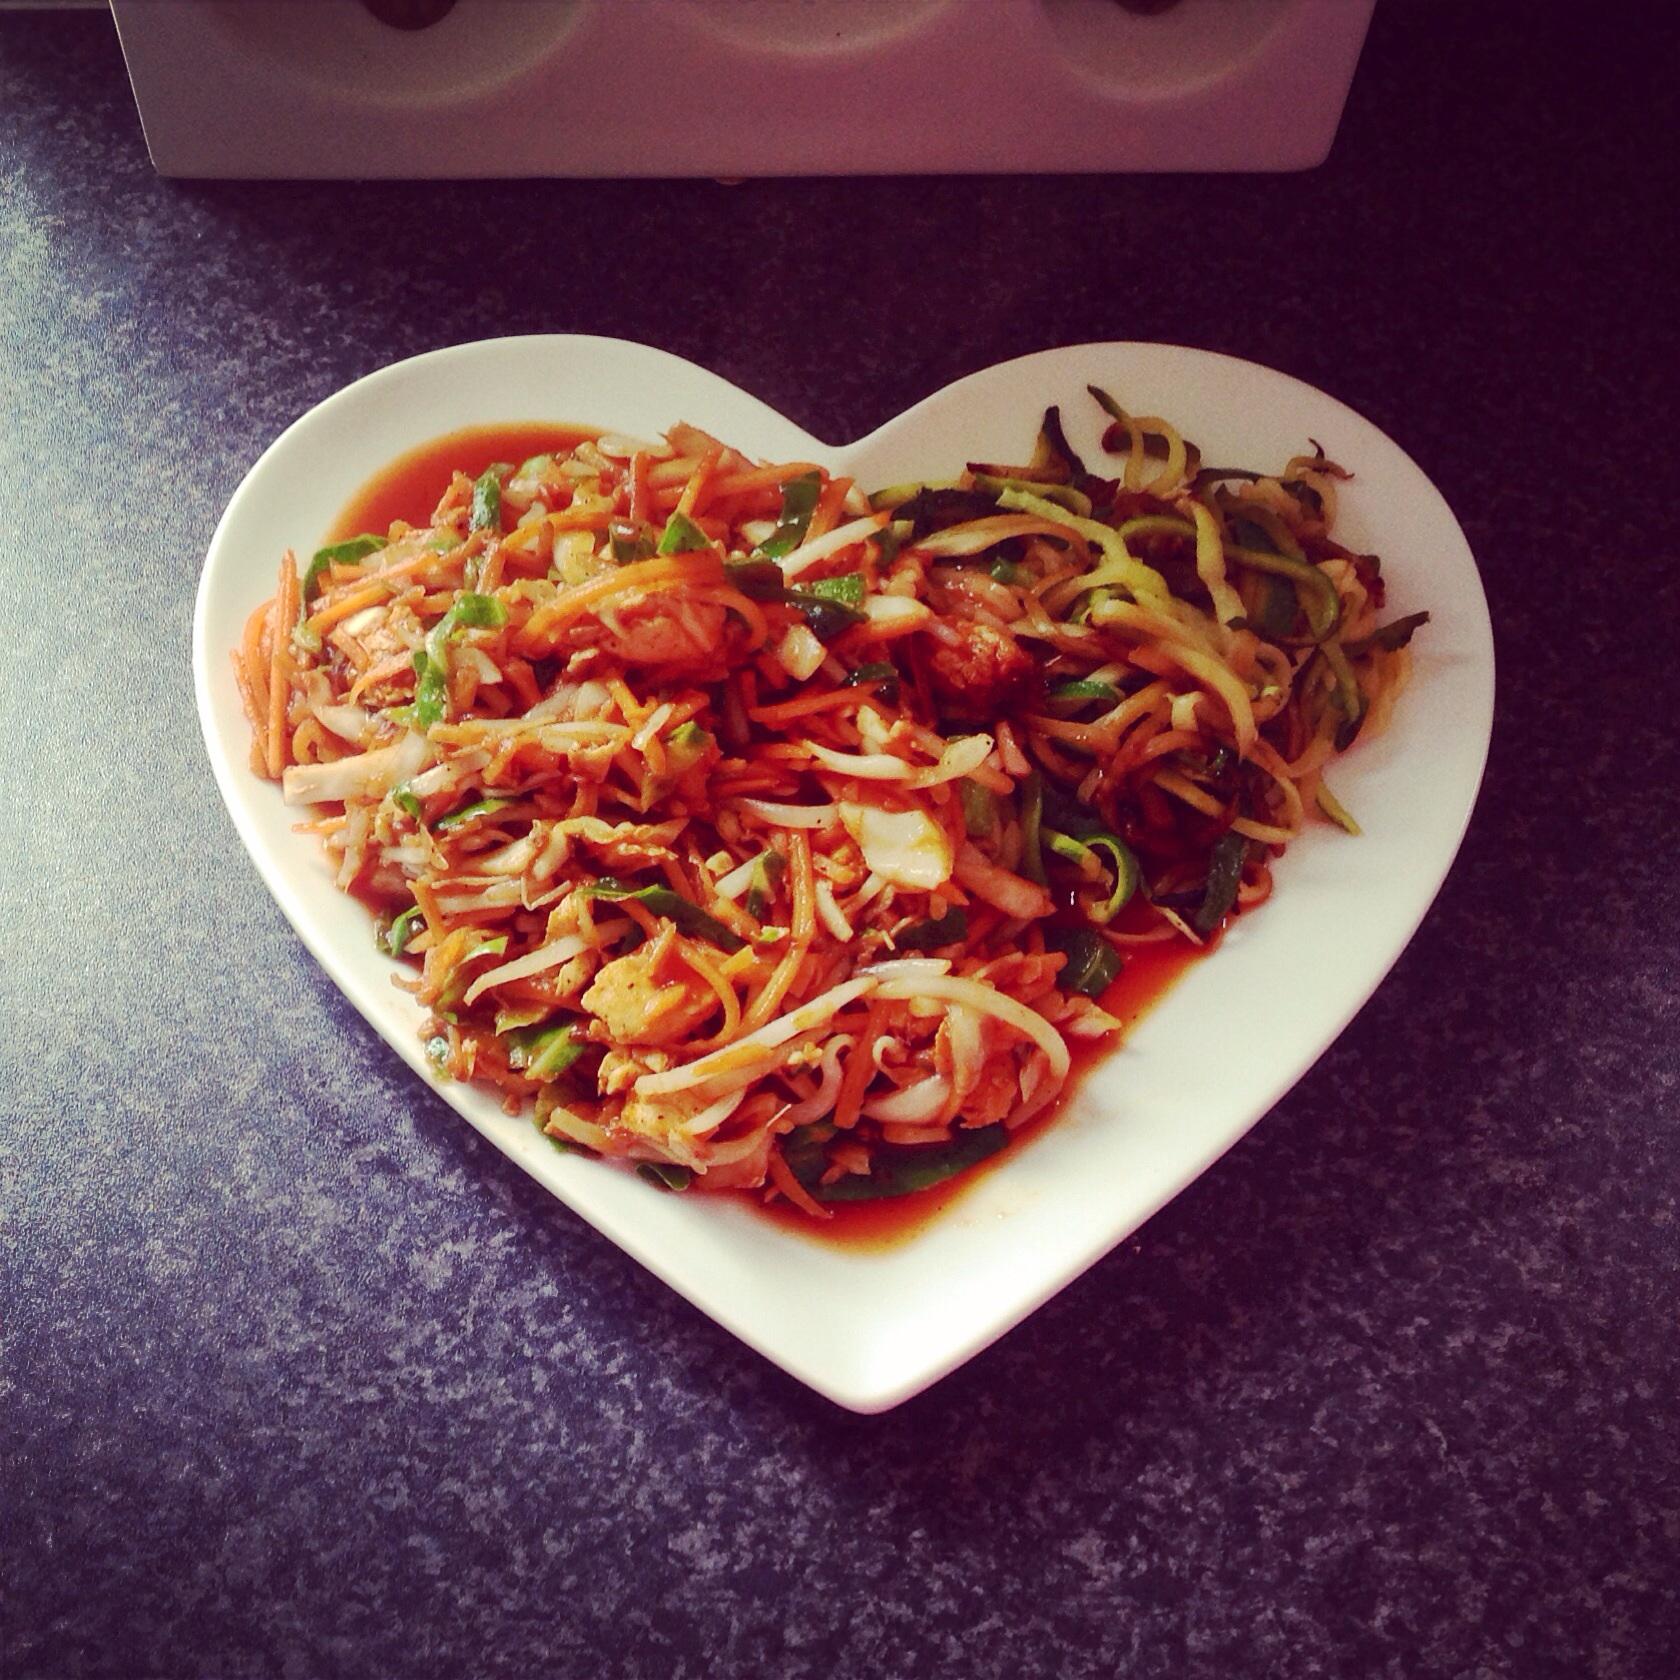 Salmon stir fry courgetti noodles